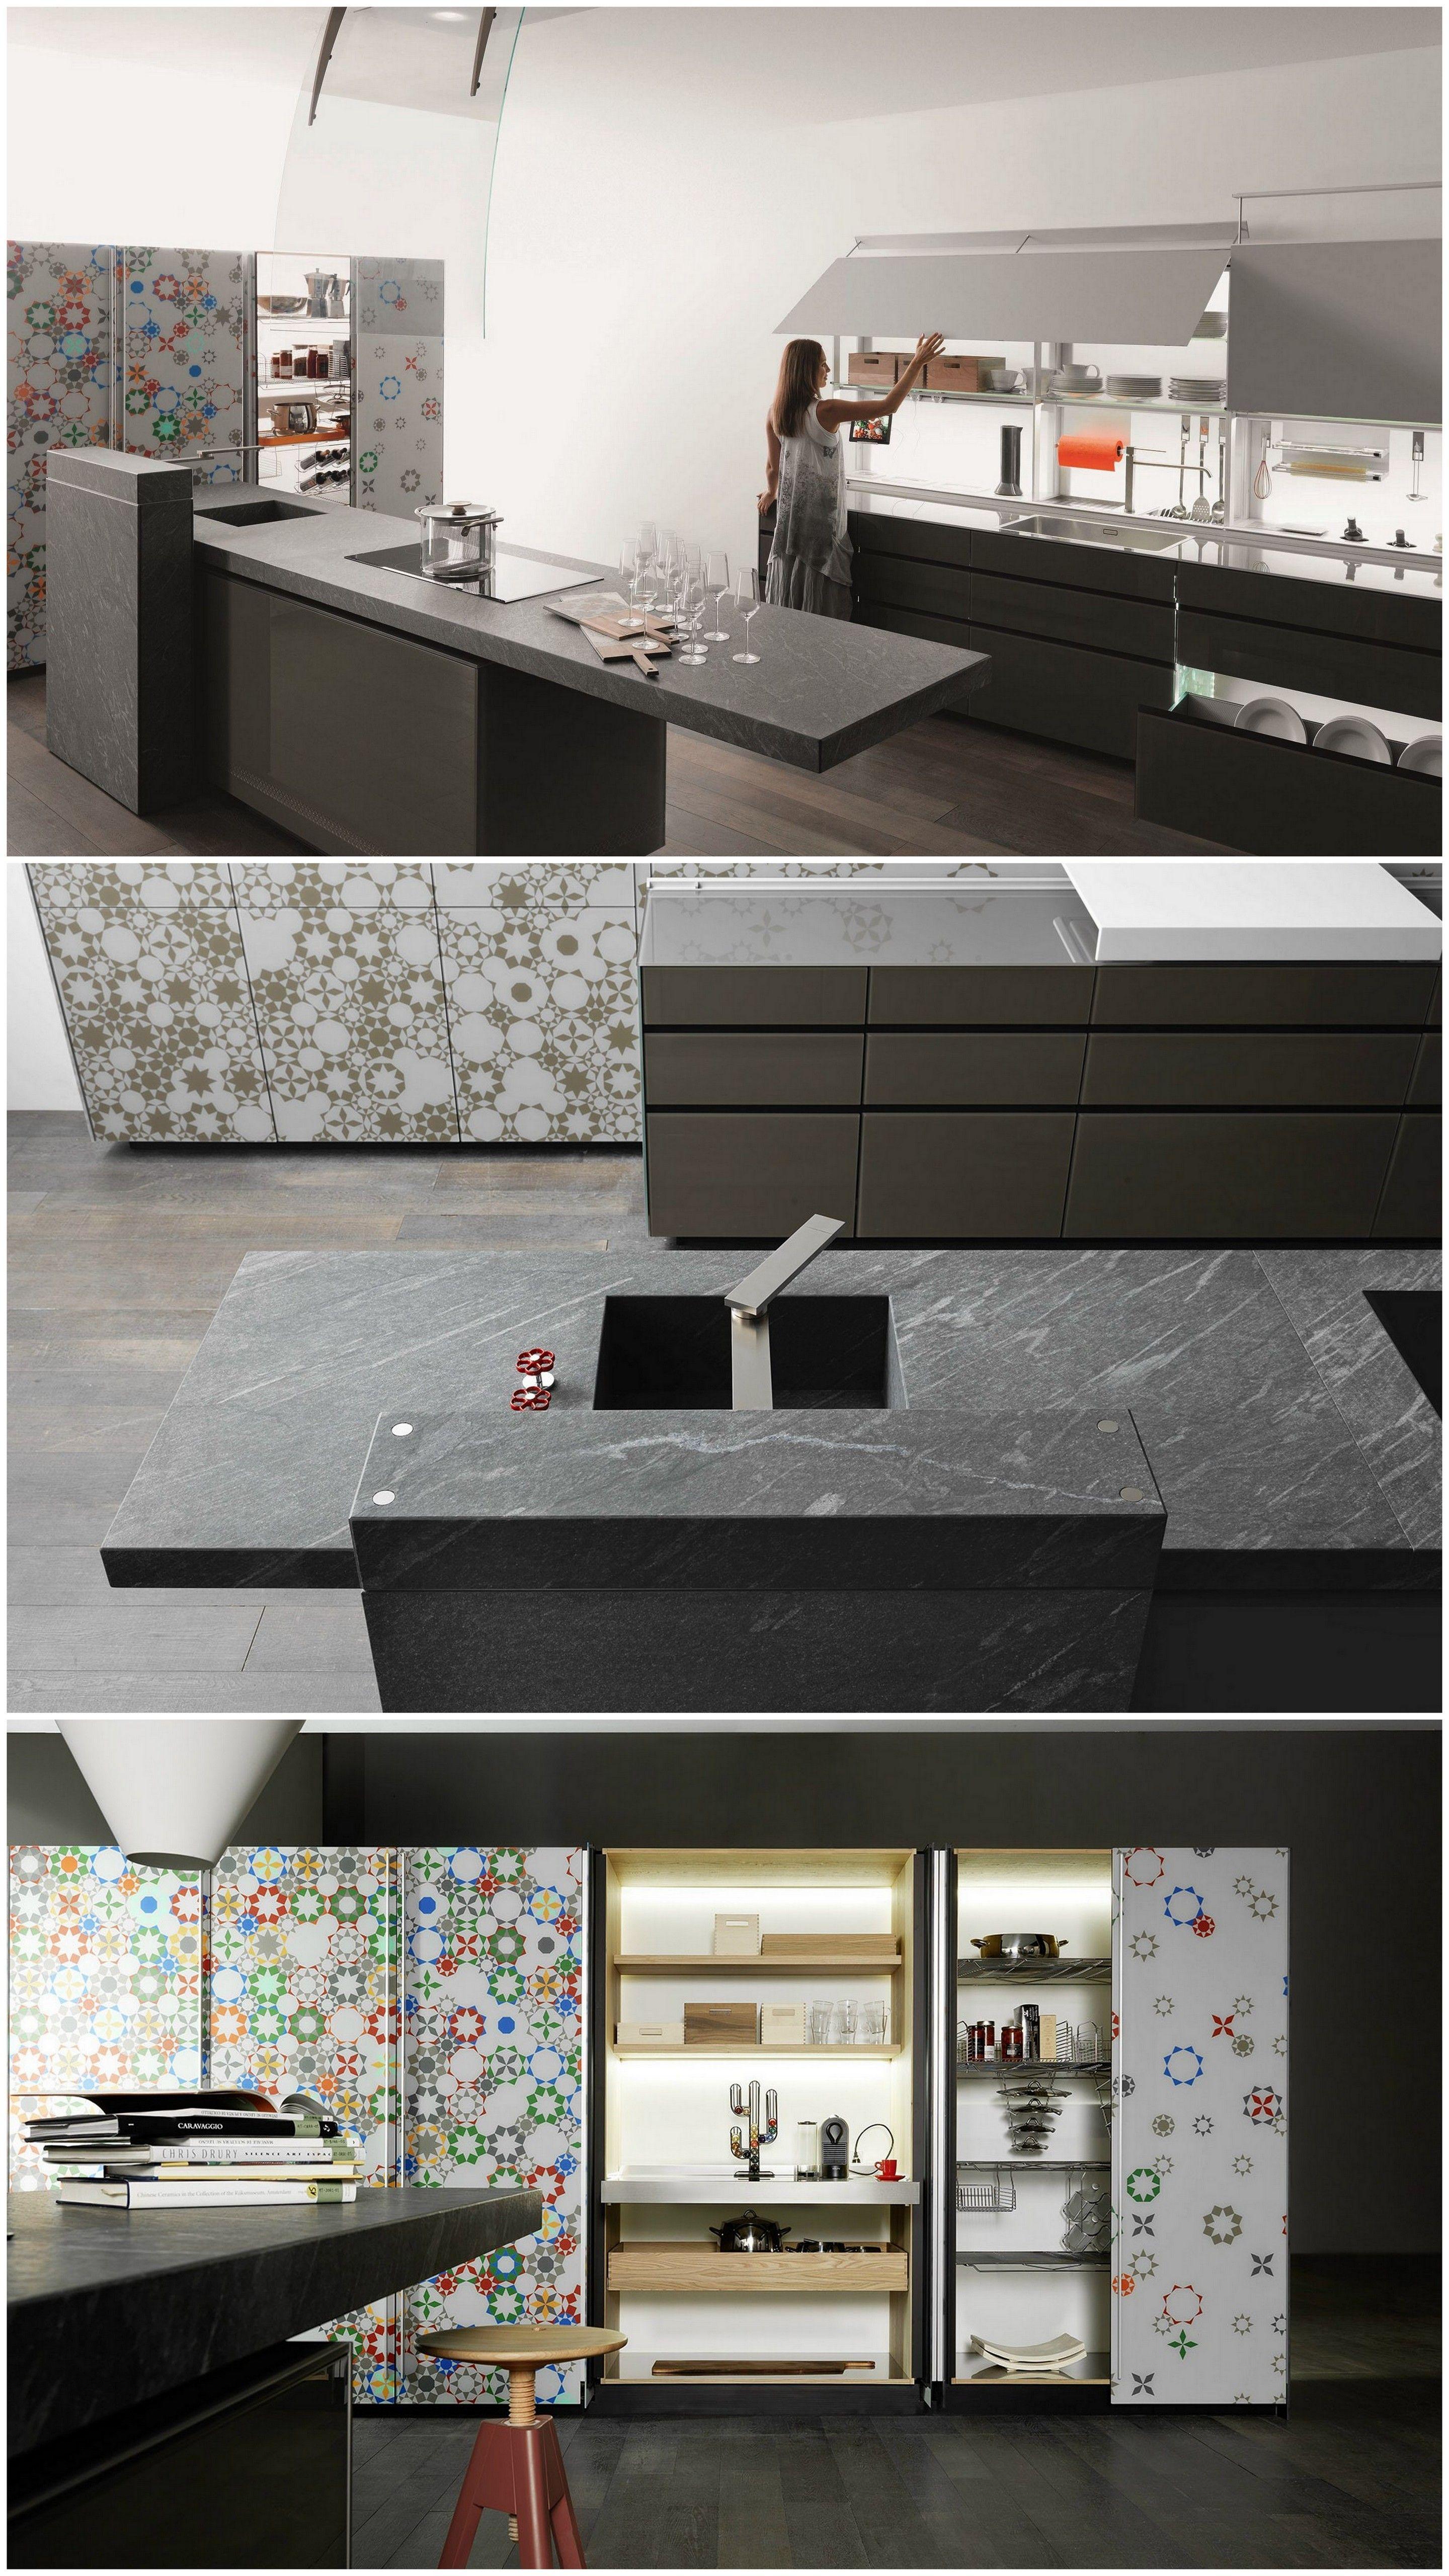 Fitted #kitchen with island NEW LOGICA SYSTEM | ARTEMATICA VITRUM Artematica Line by @valcucine | #design Gabriele Centazzo